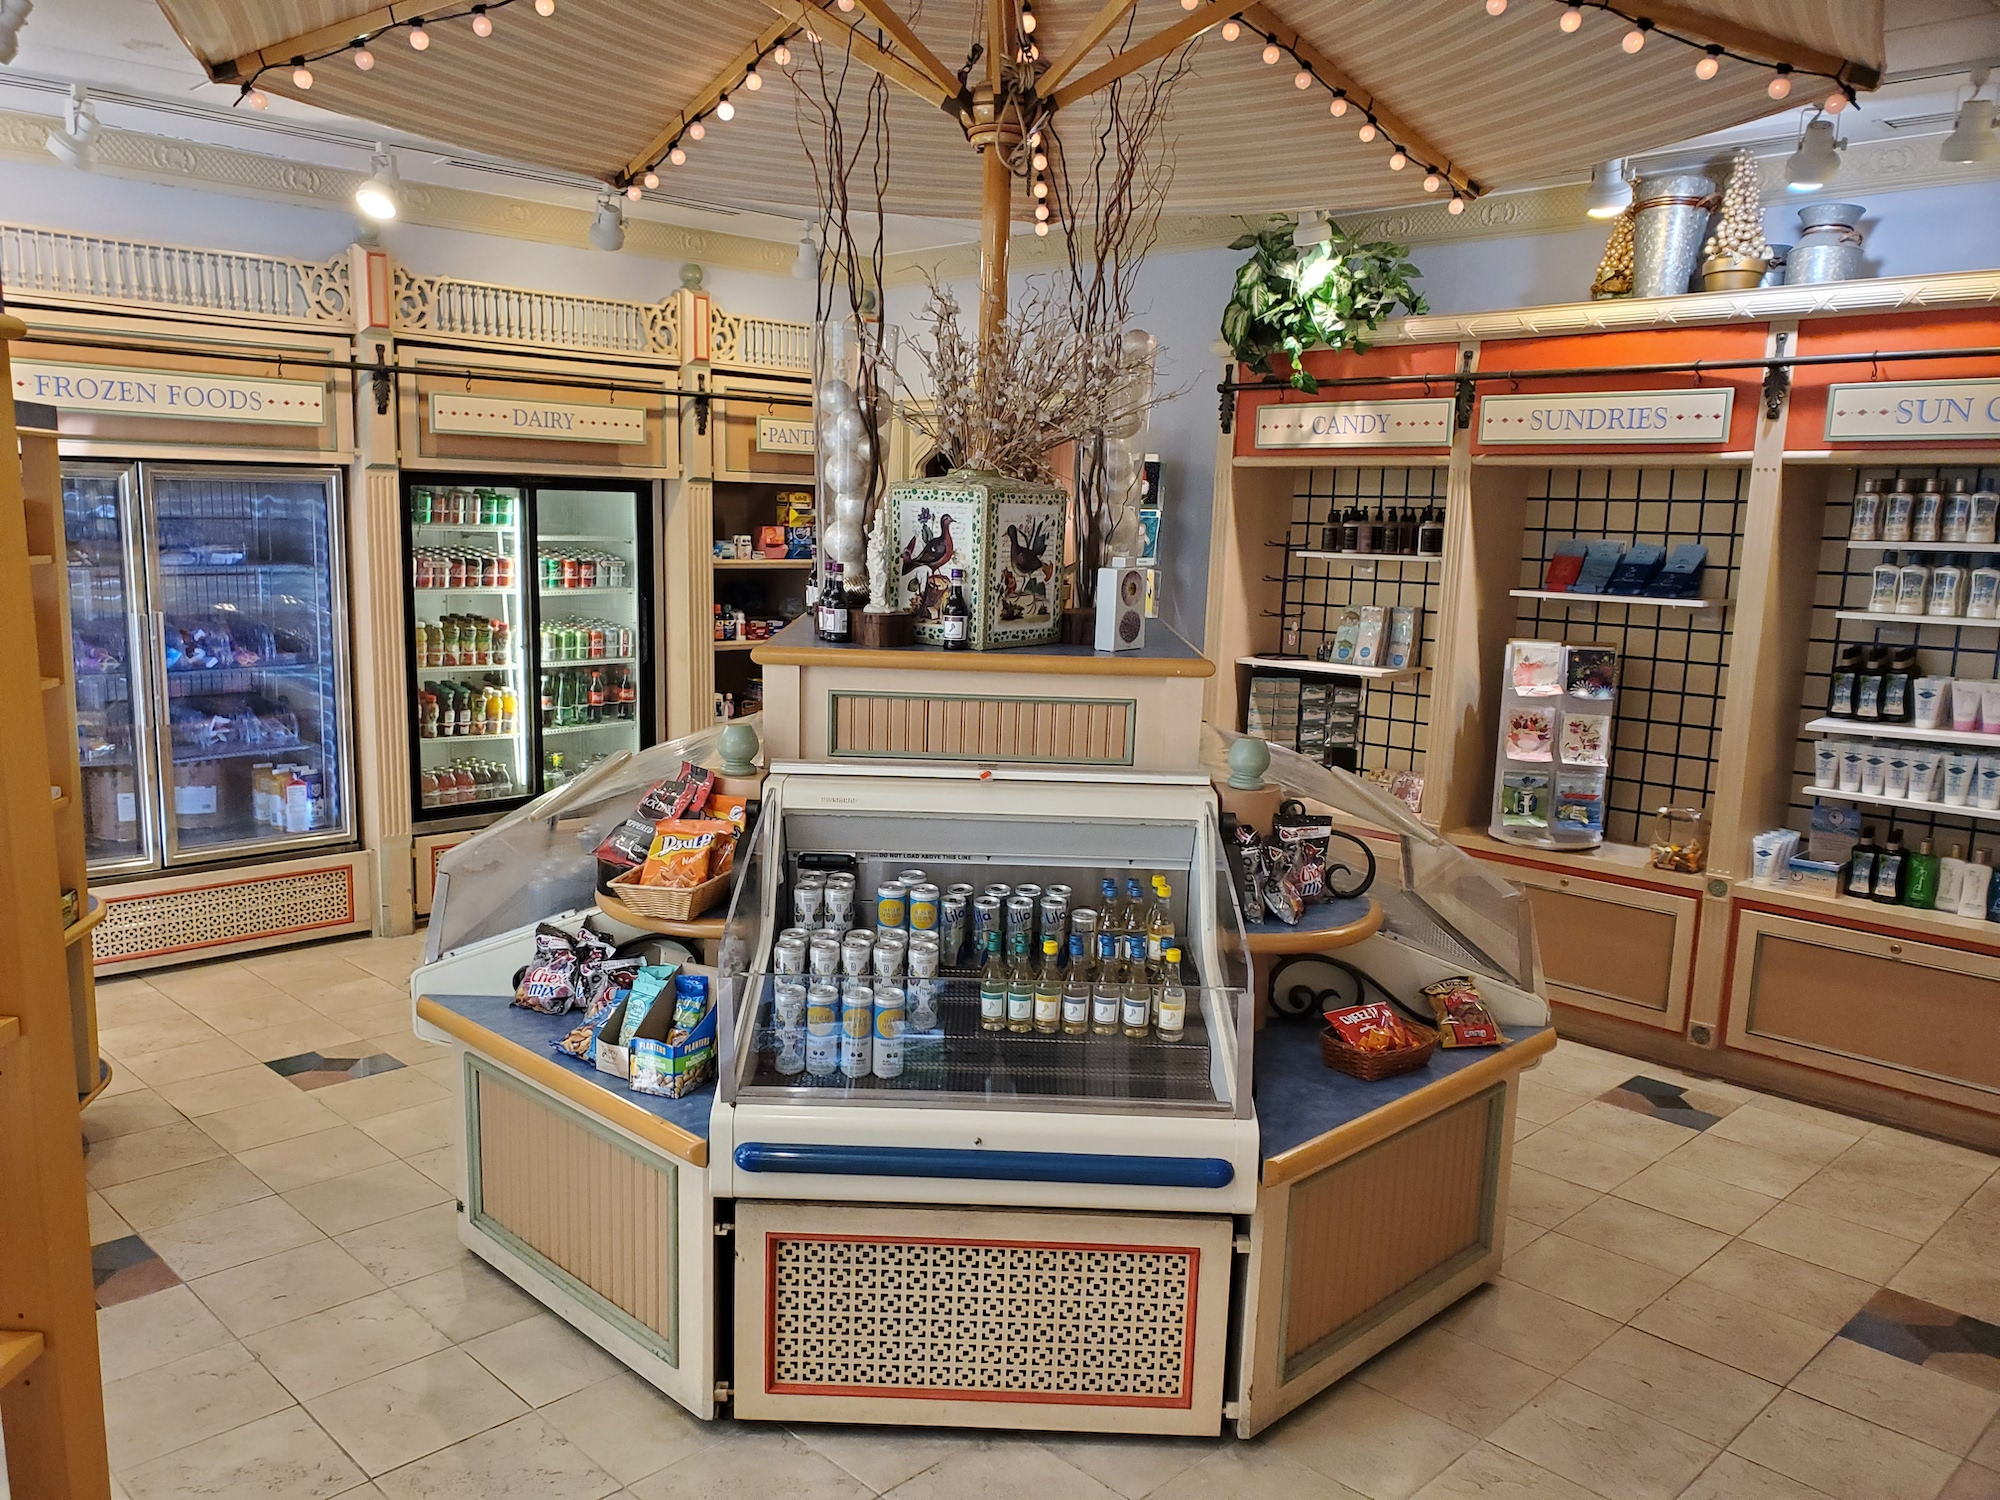 lago mar soda shop interior cheese display umbrella